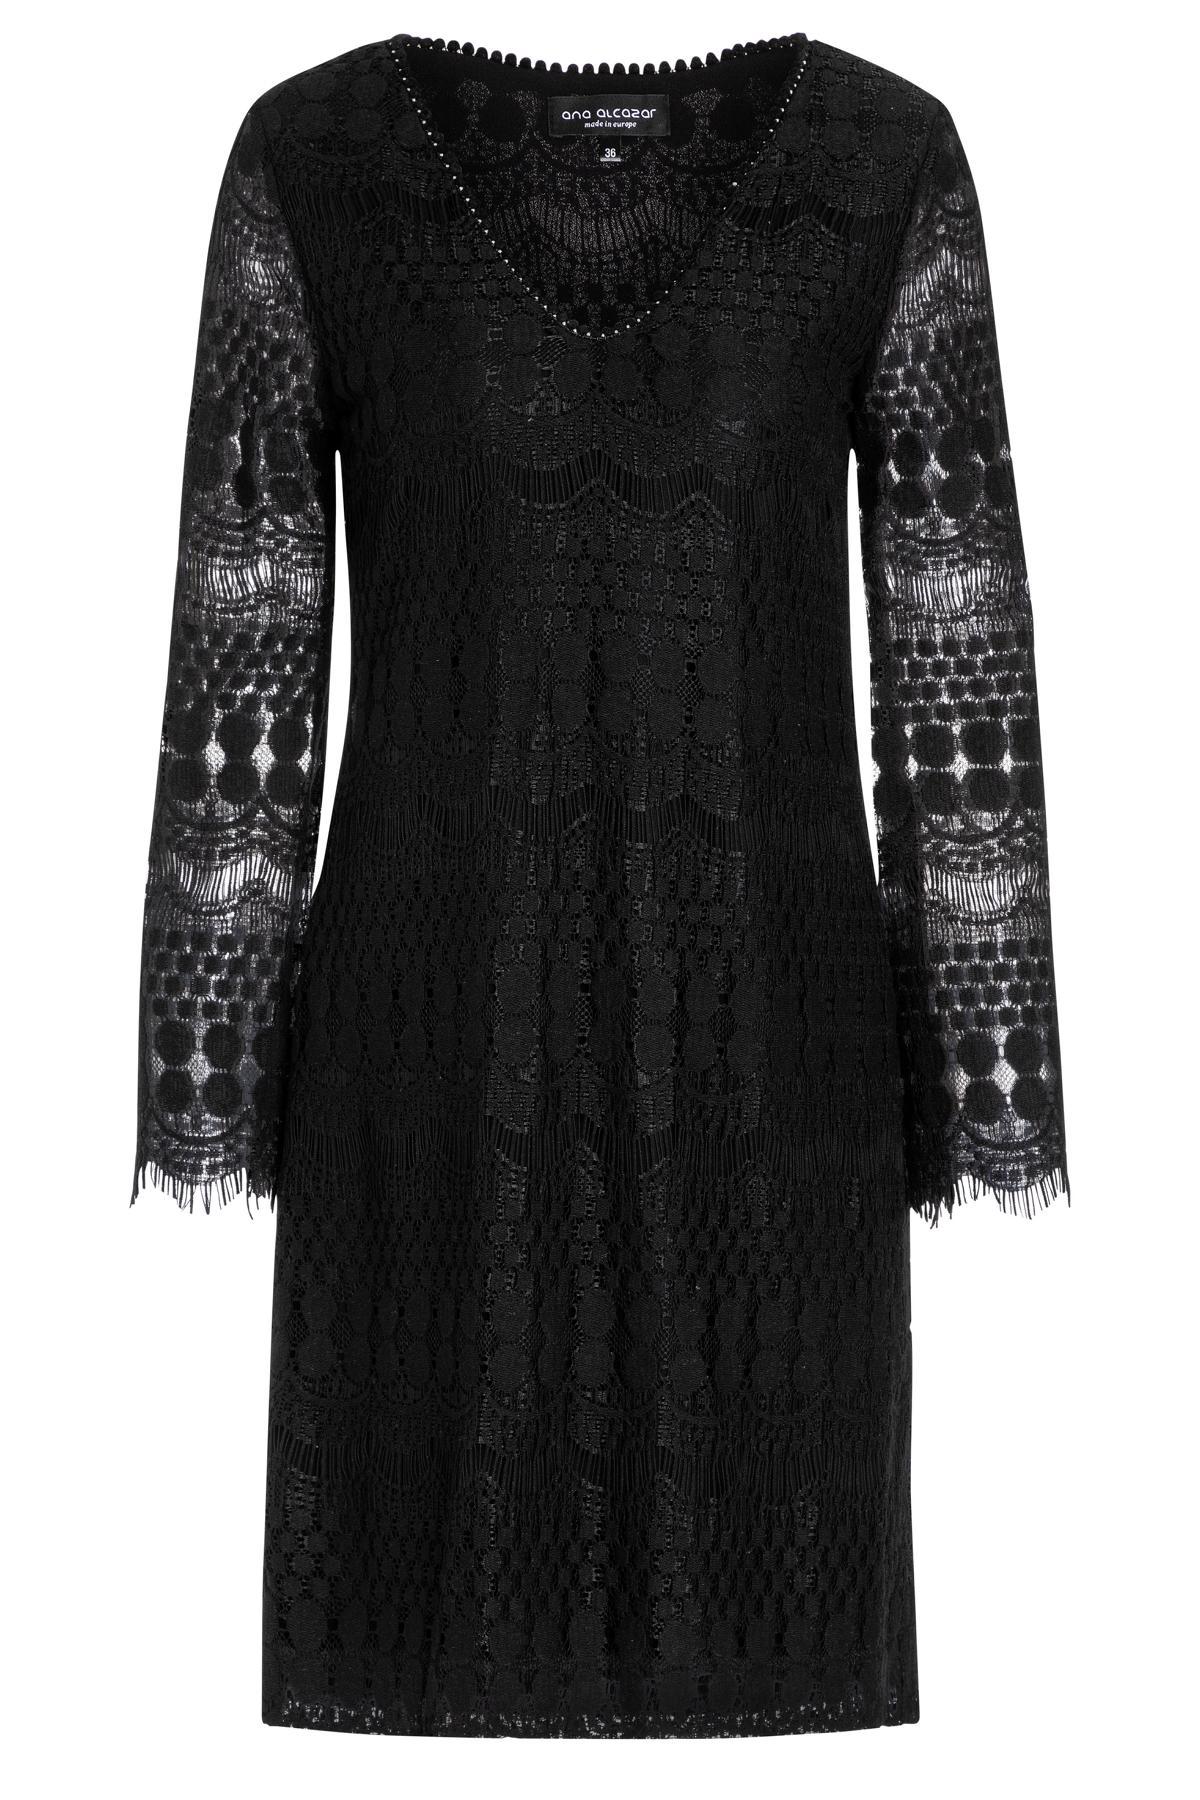 Ana Alcazar Tunic Dress Sanice Black